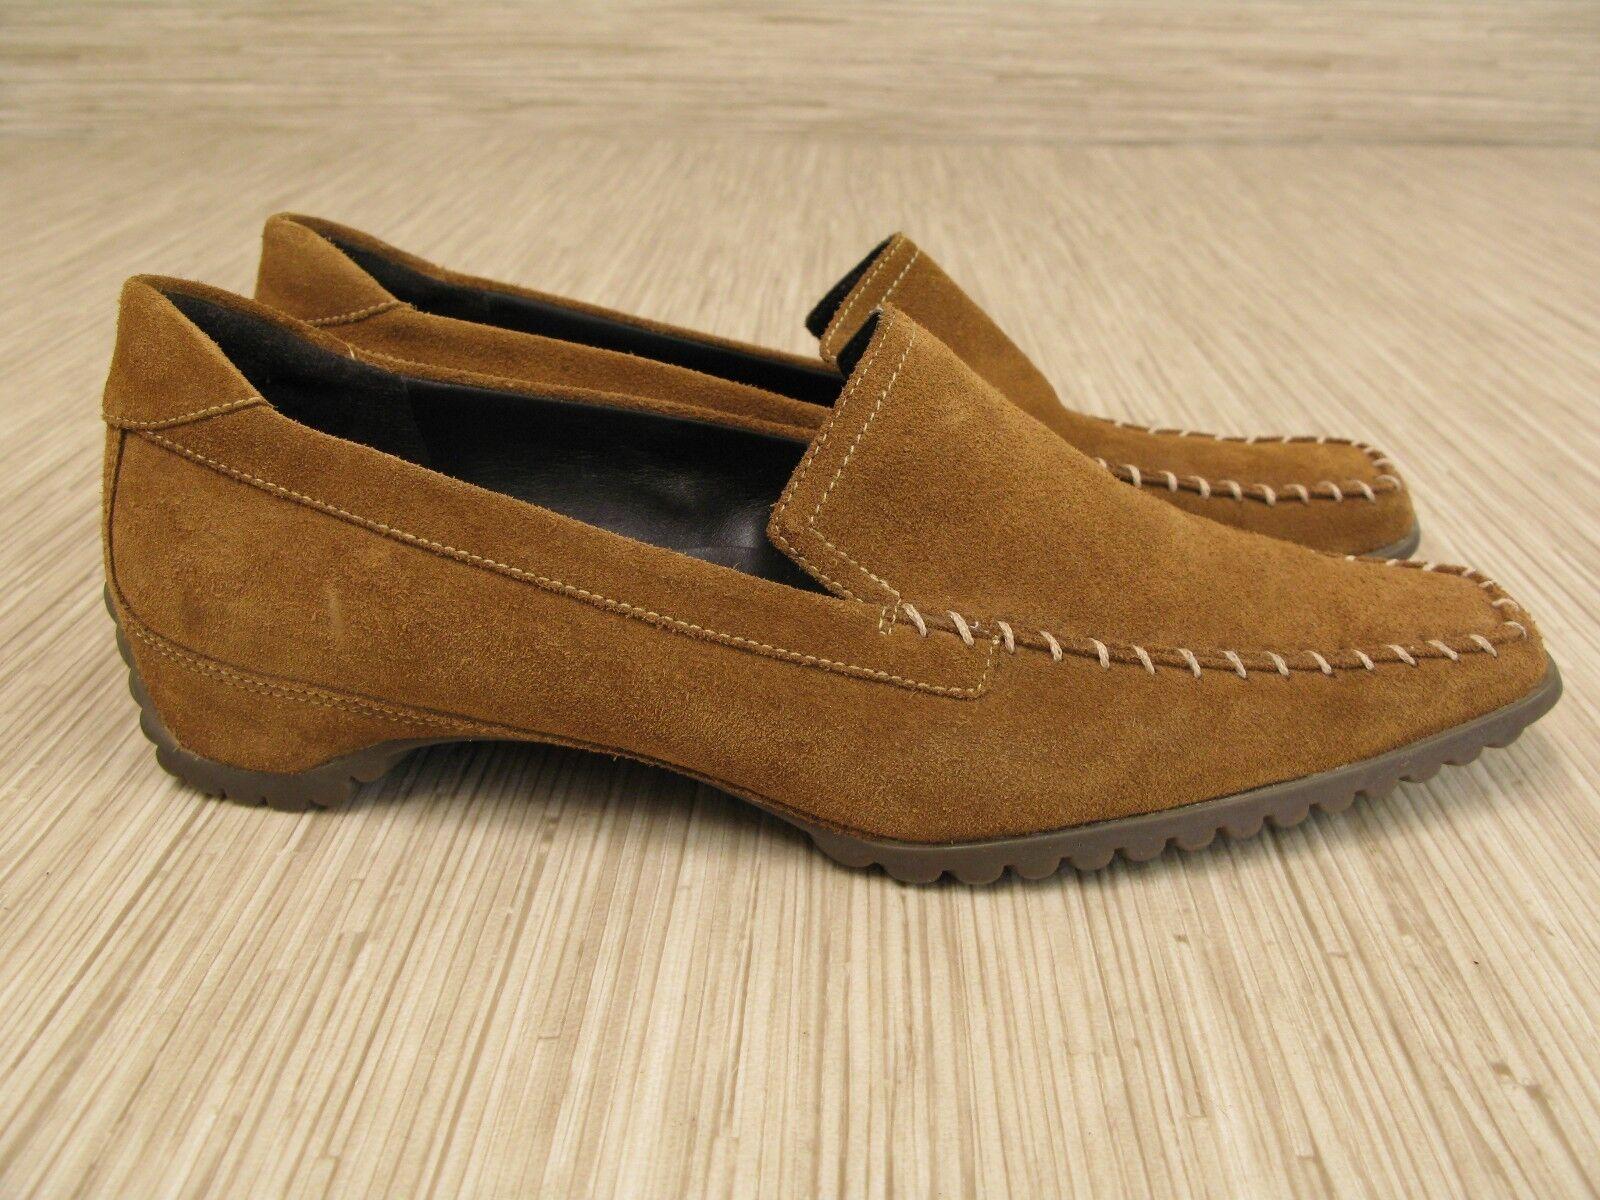 Ecco marrone Suede Loafers Donna Taglia US 9-10 EUR 40 Casual Scarpe Heels Slip-On